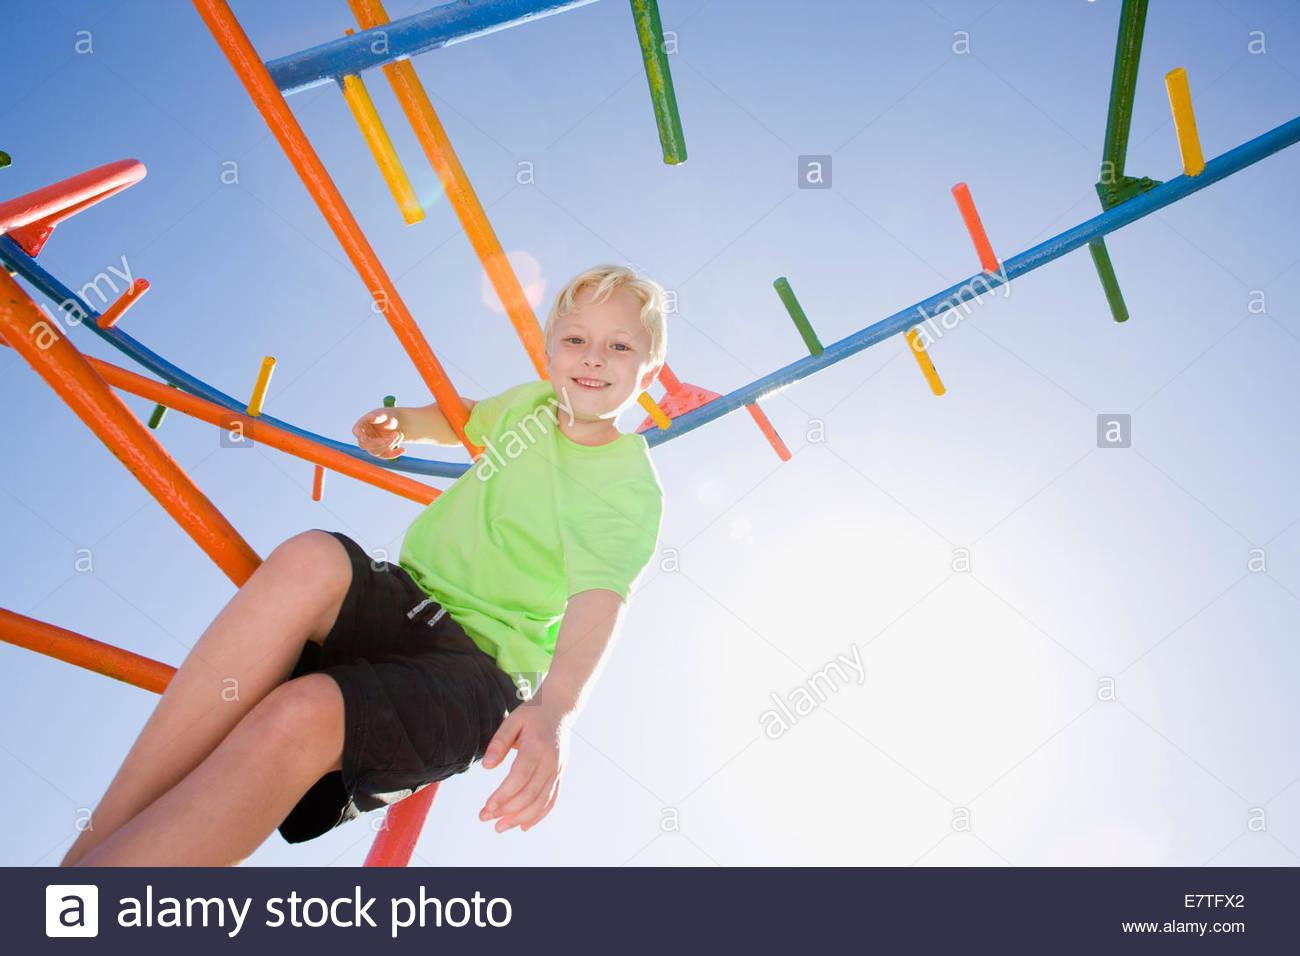 Smiling boy playing on monkey bars at playground - Stock Image